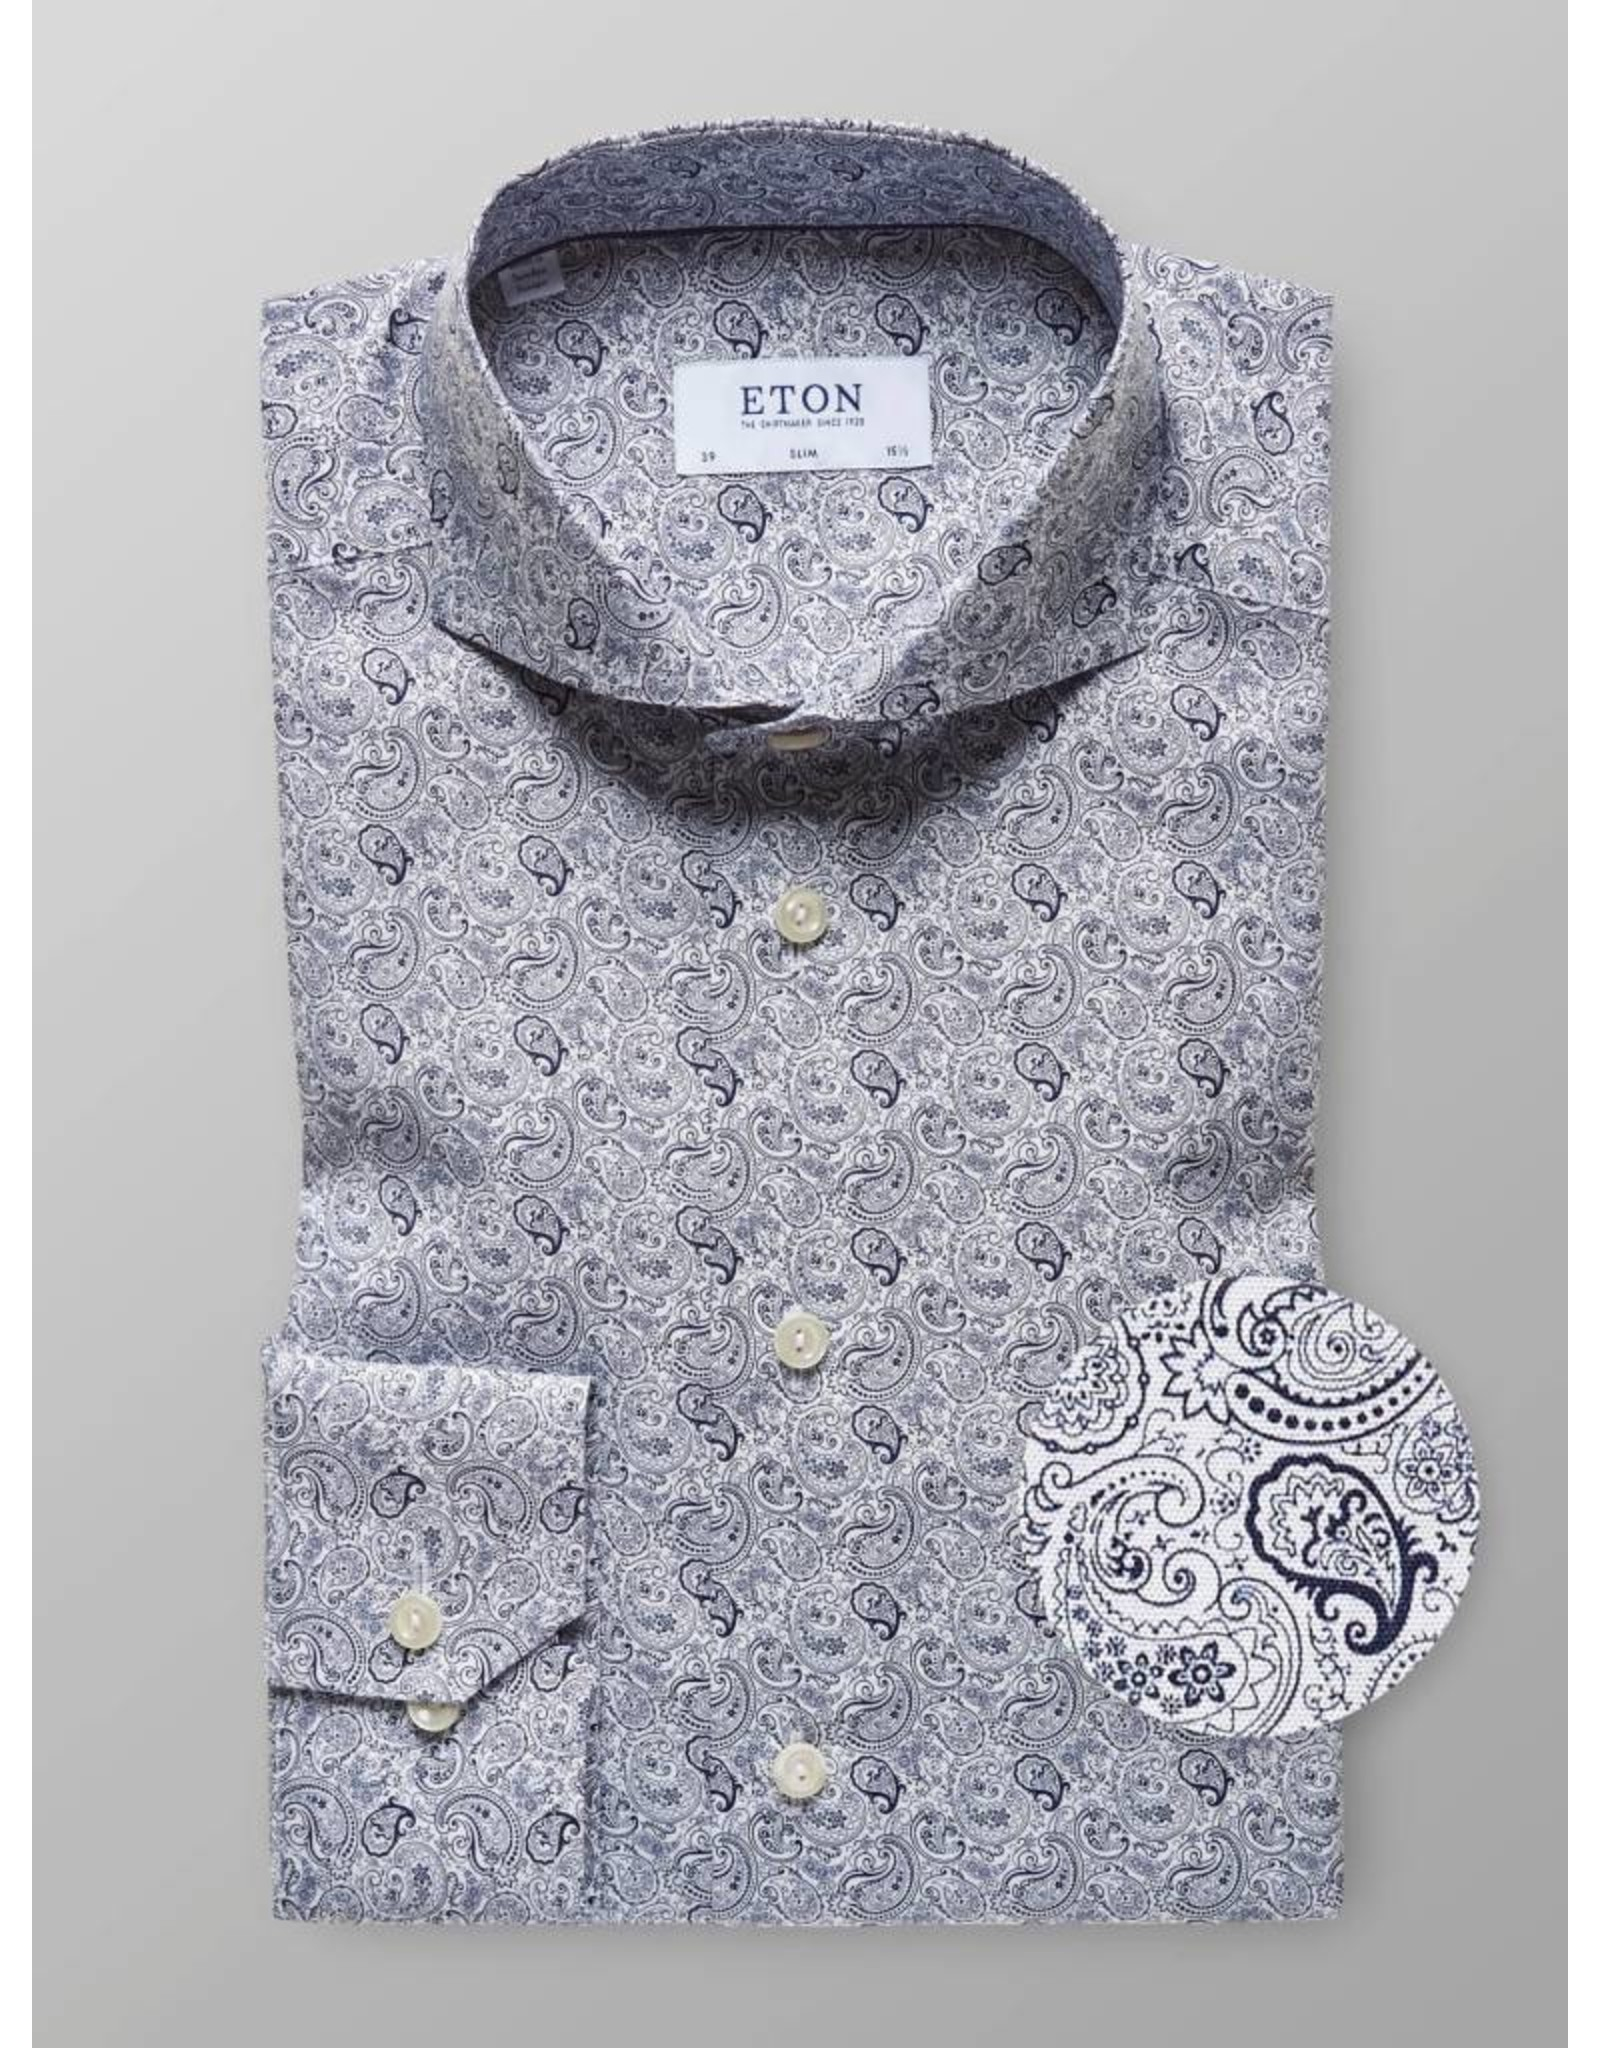 Eton Paisley Shirt